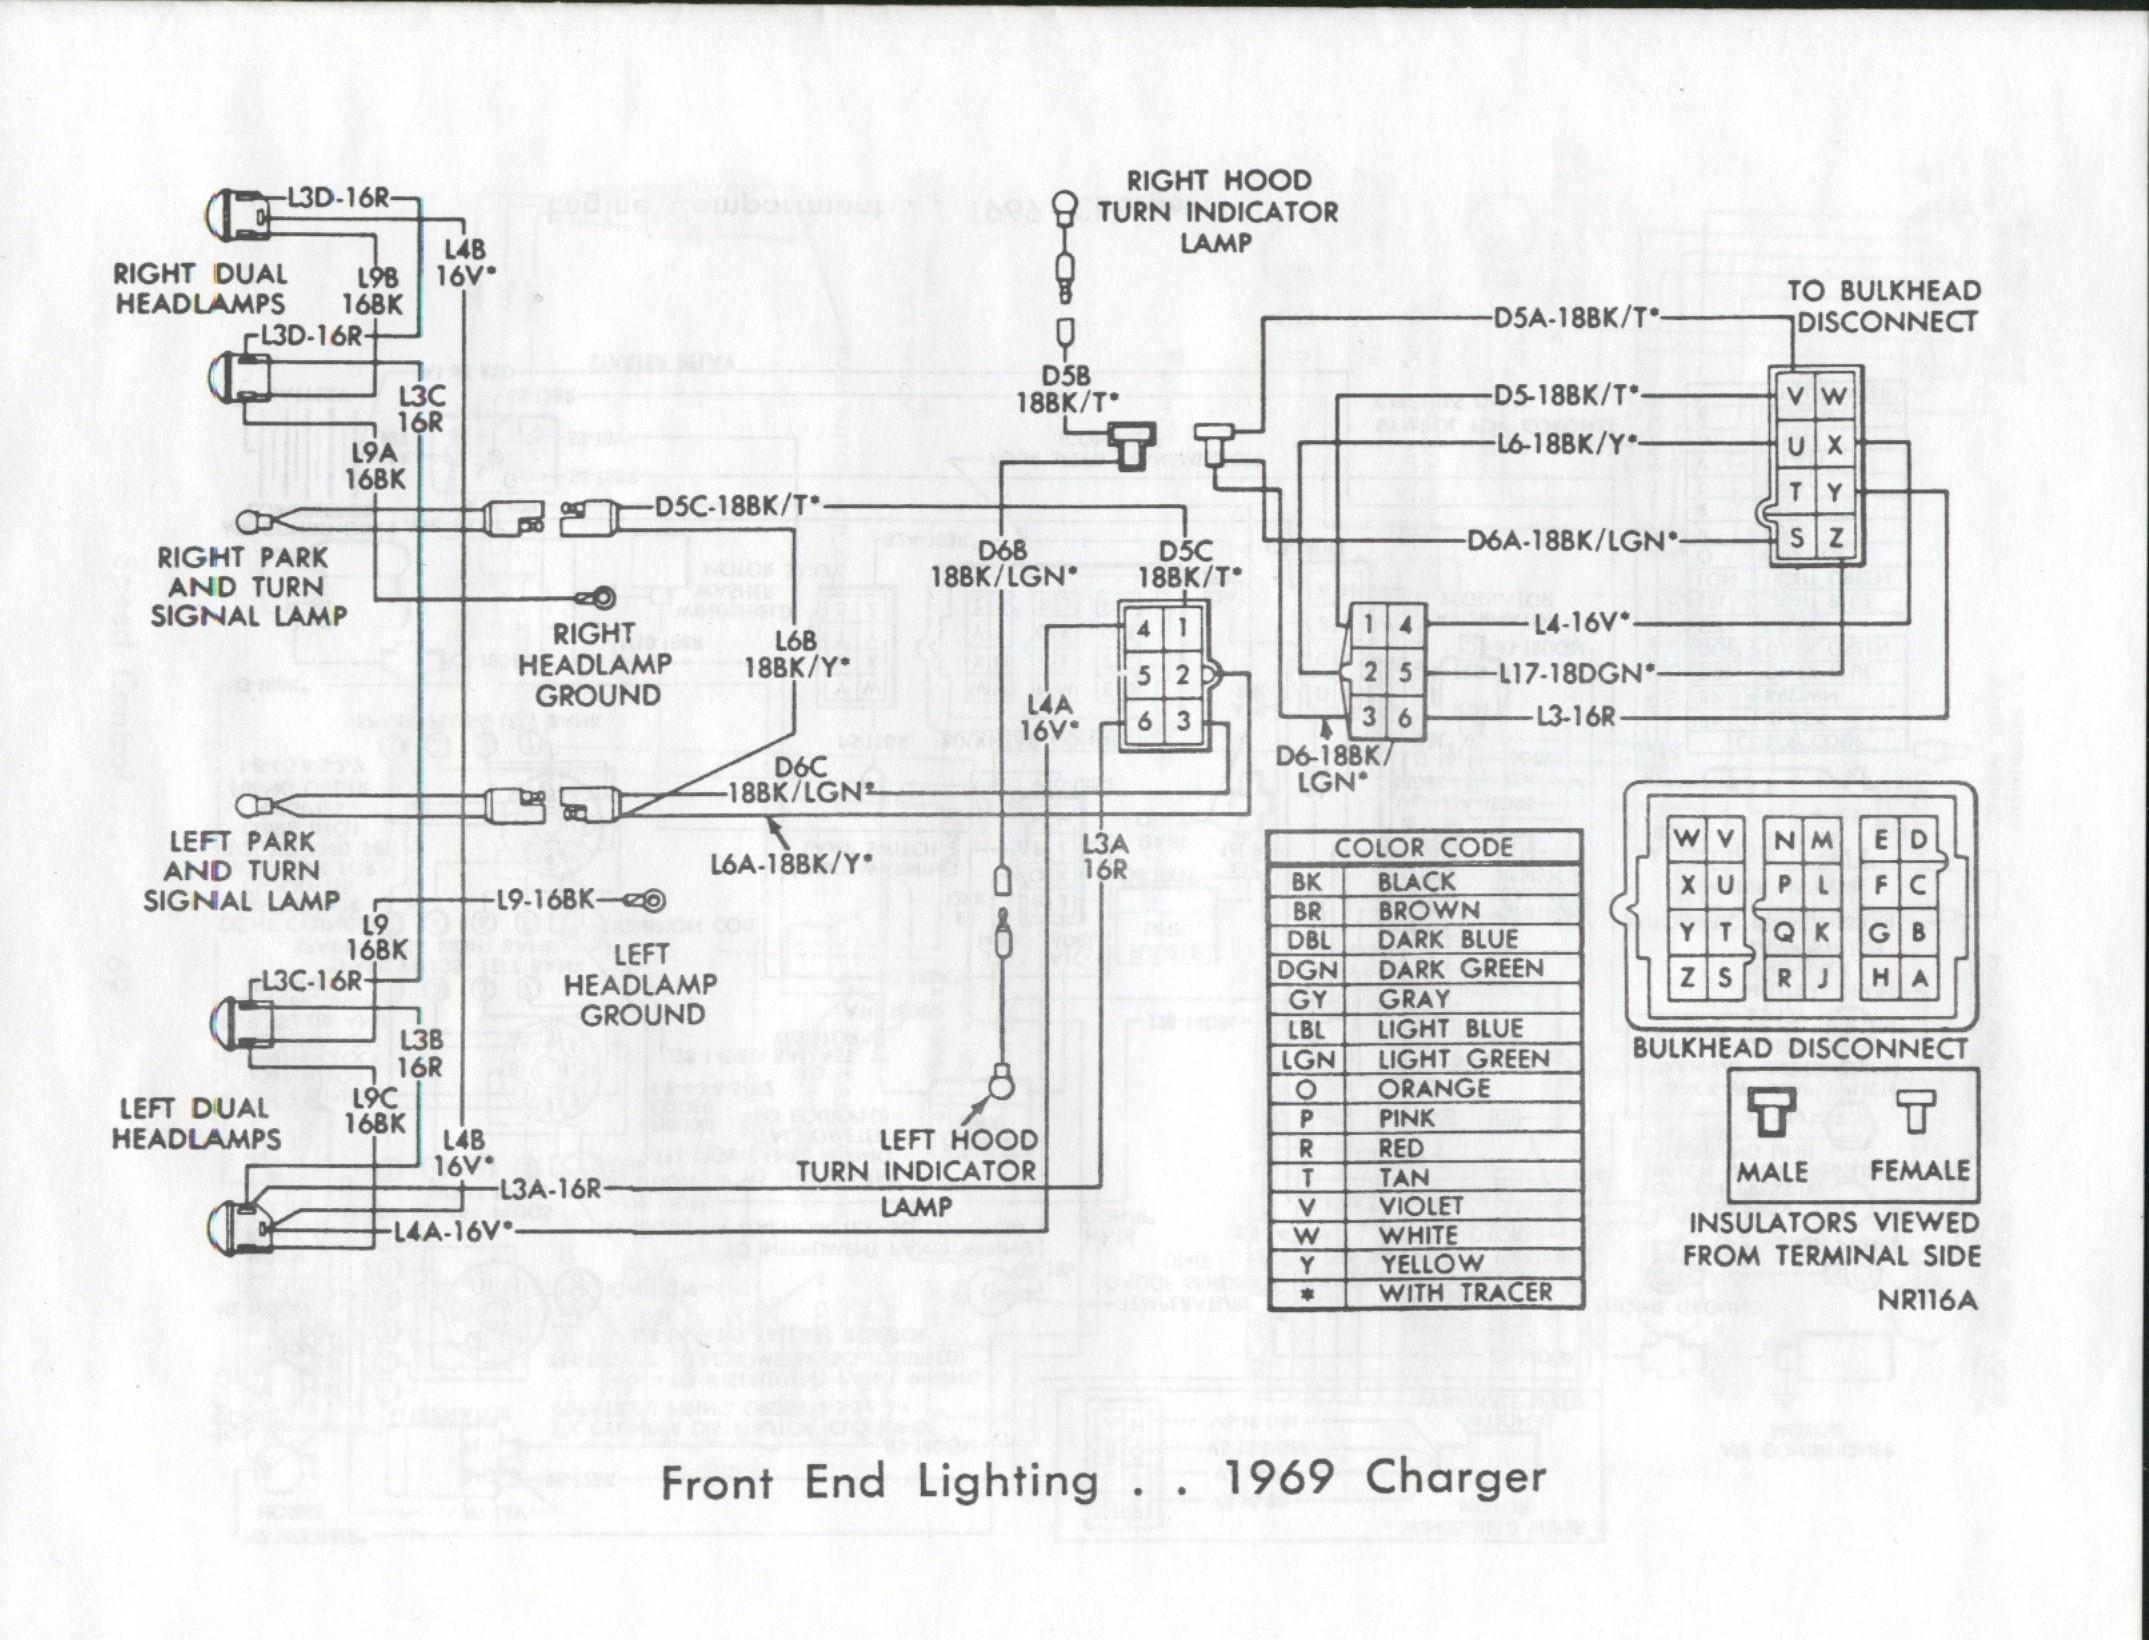 1970 dodge dart ignition wiring diagram 4 pin flat trailer plug manual e books best librarydodge harness schematics 1974